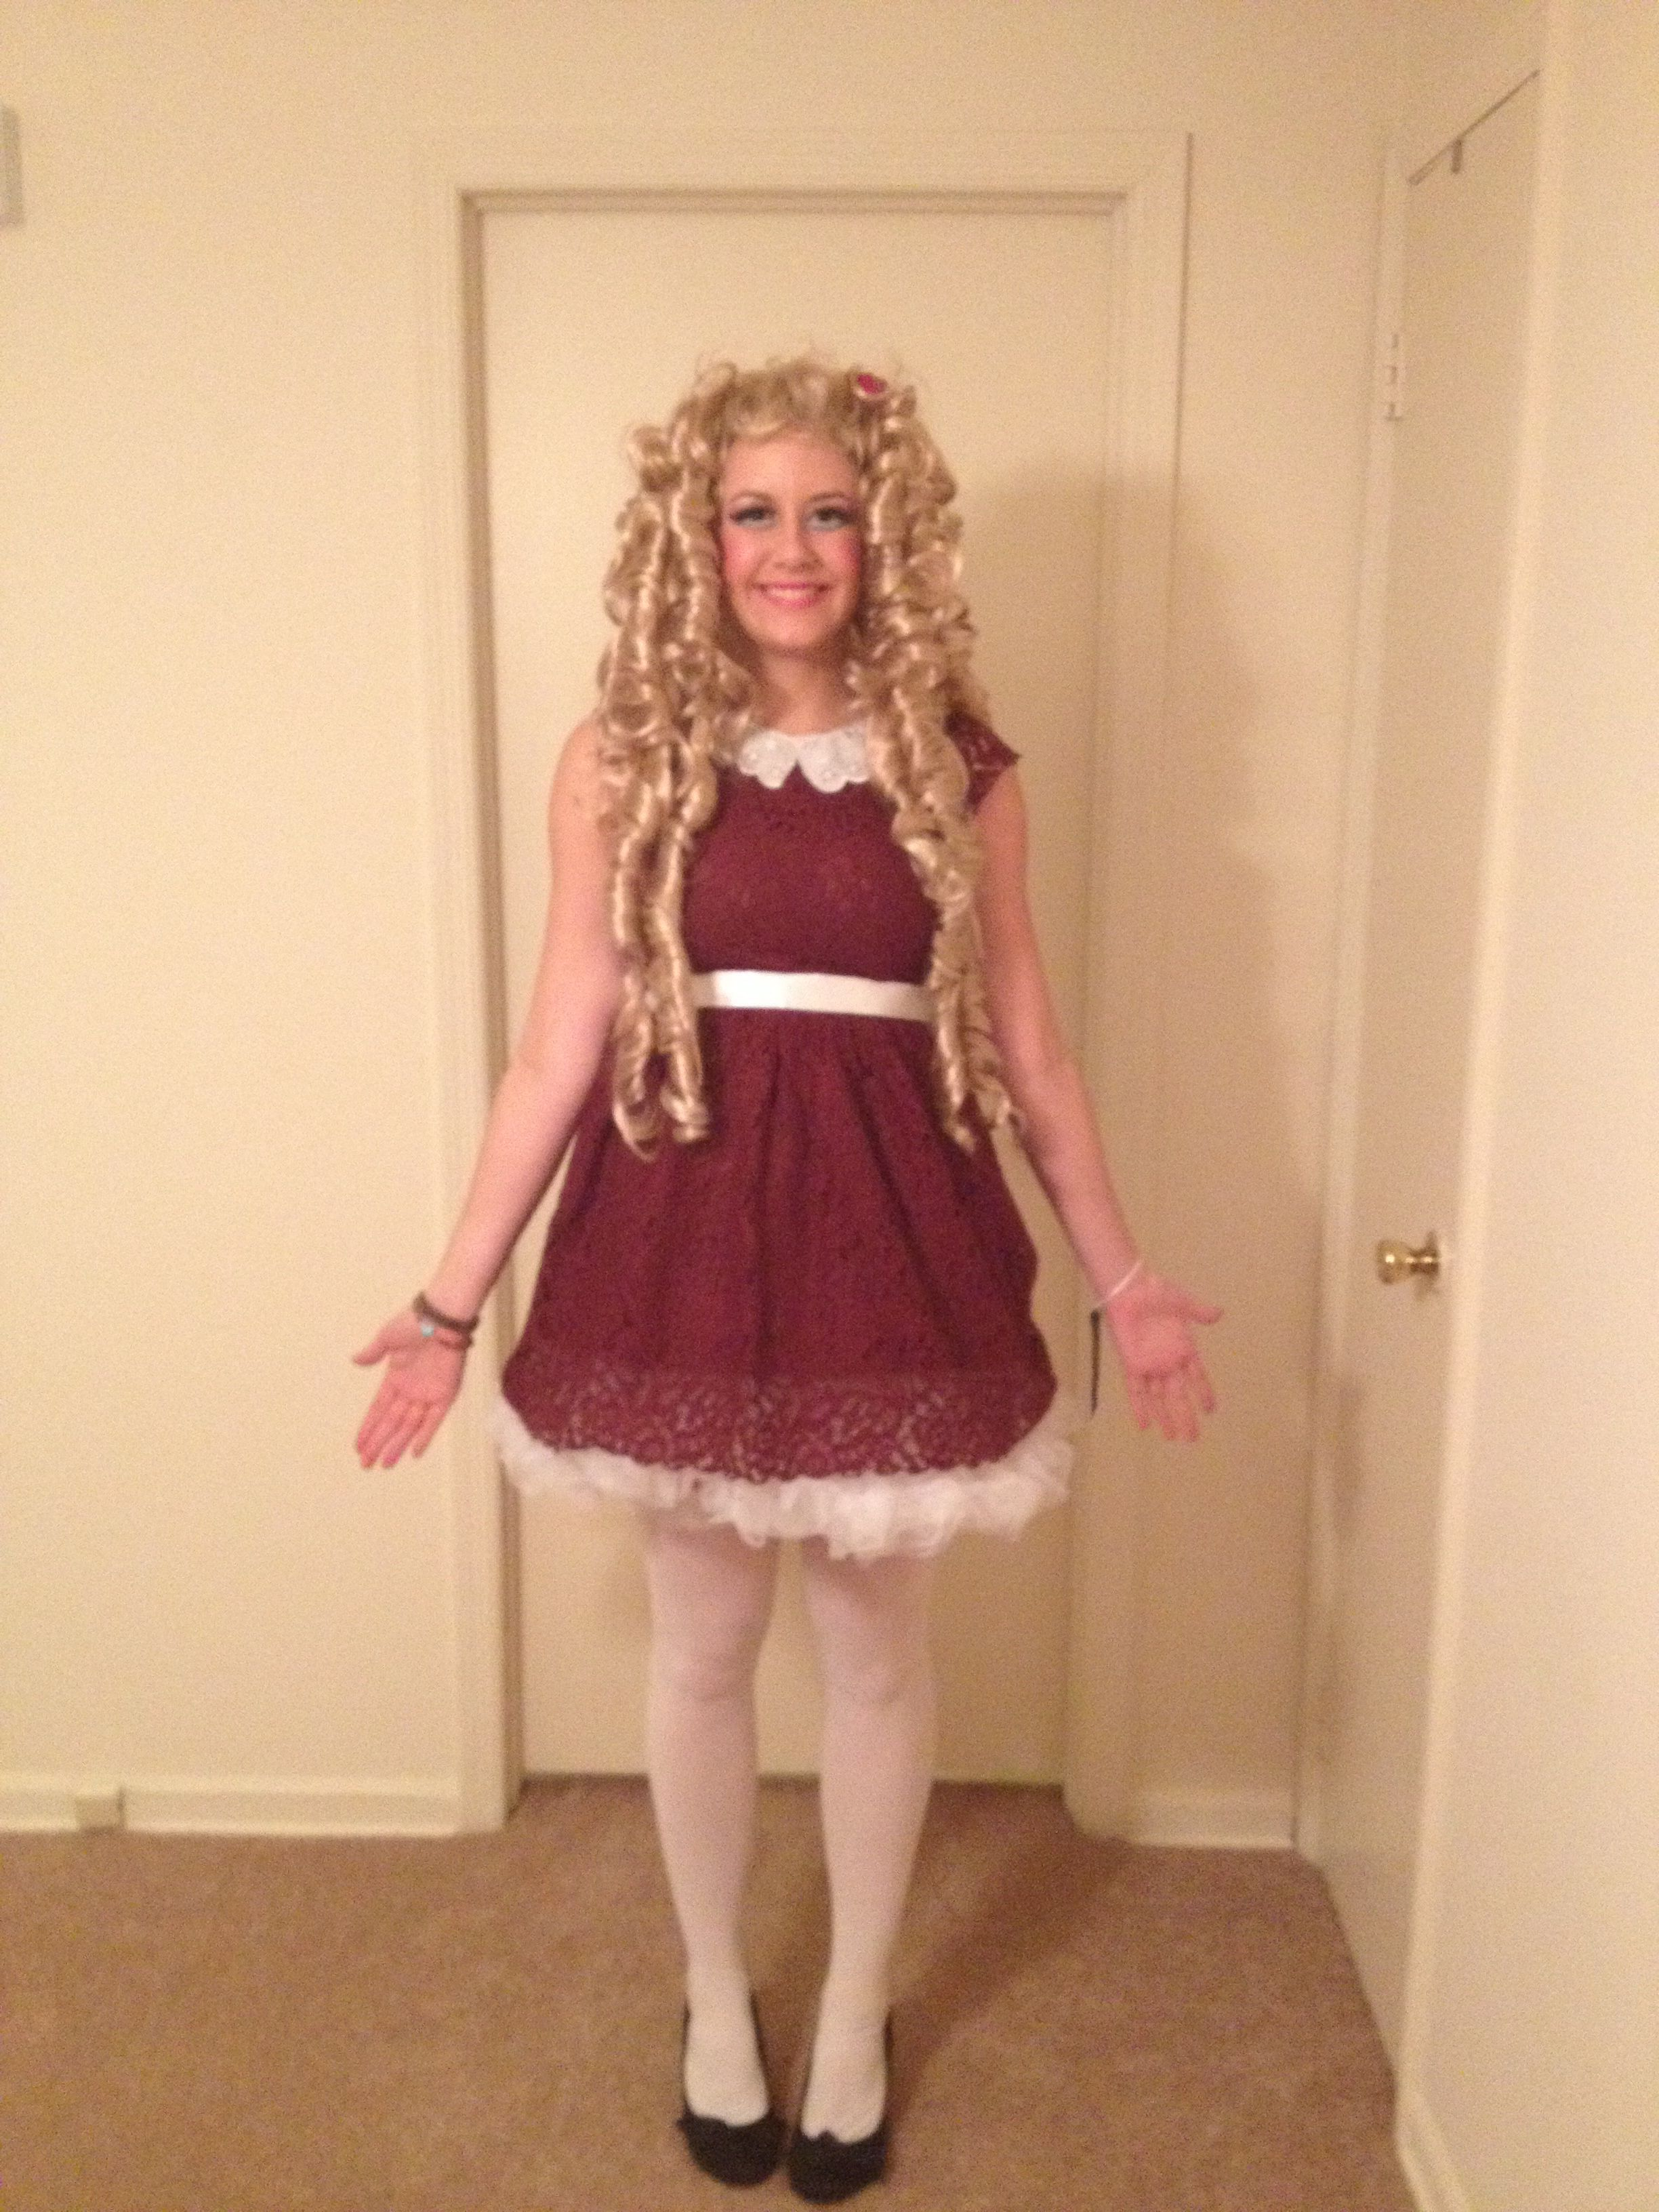 Diy Doll Costume Diy Doll Costume Doll Costume Outfits